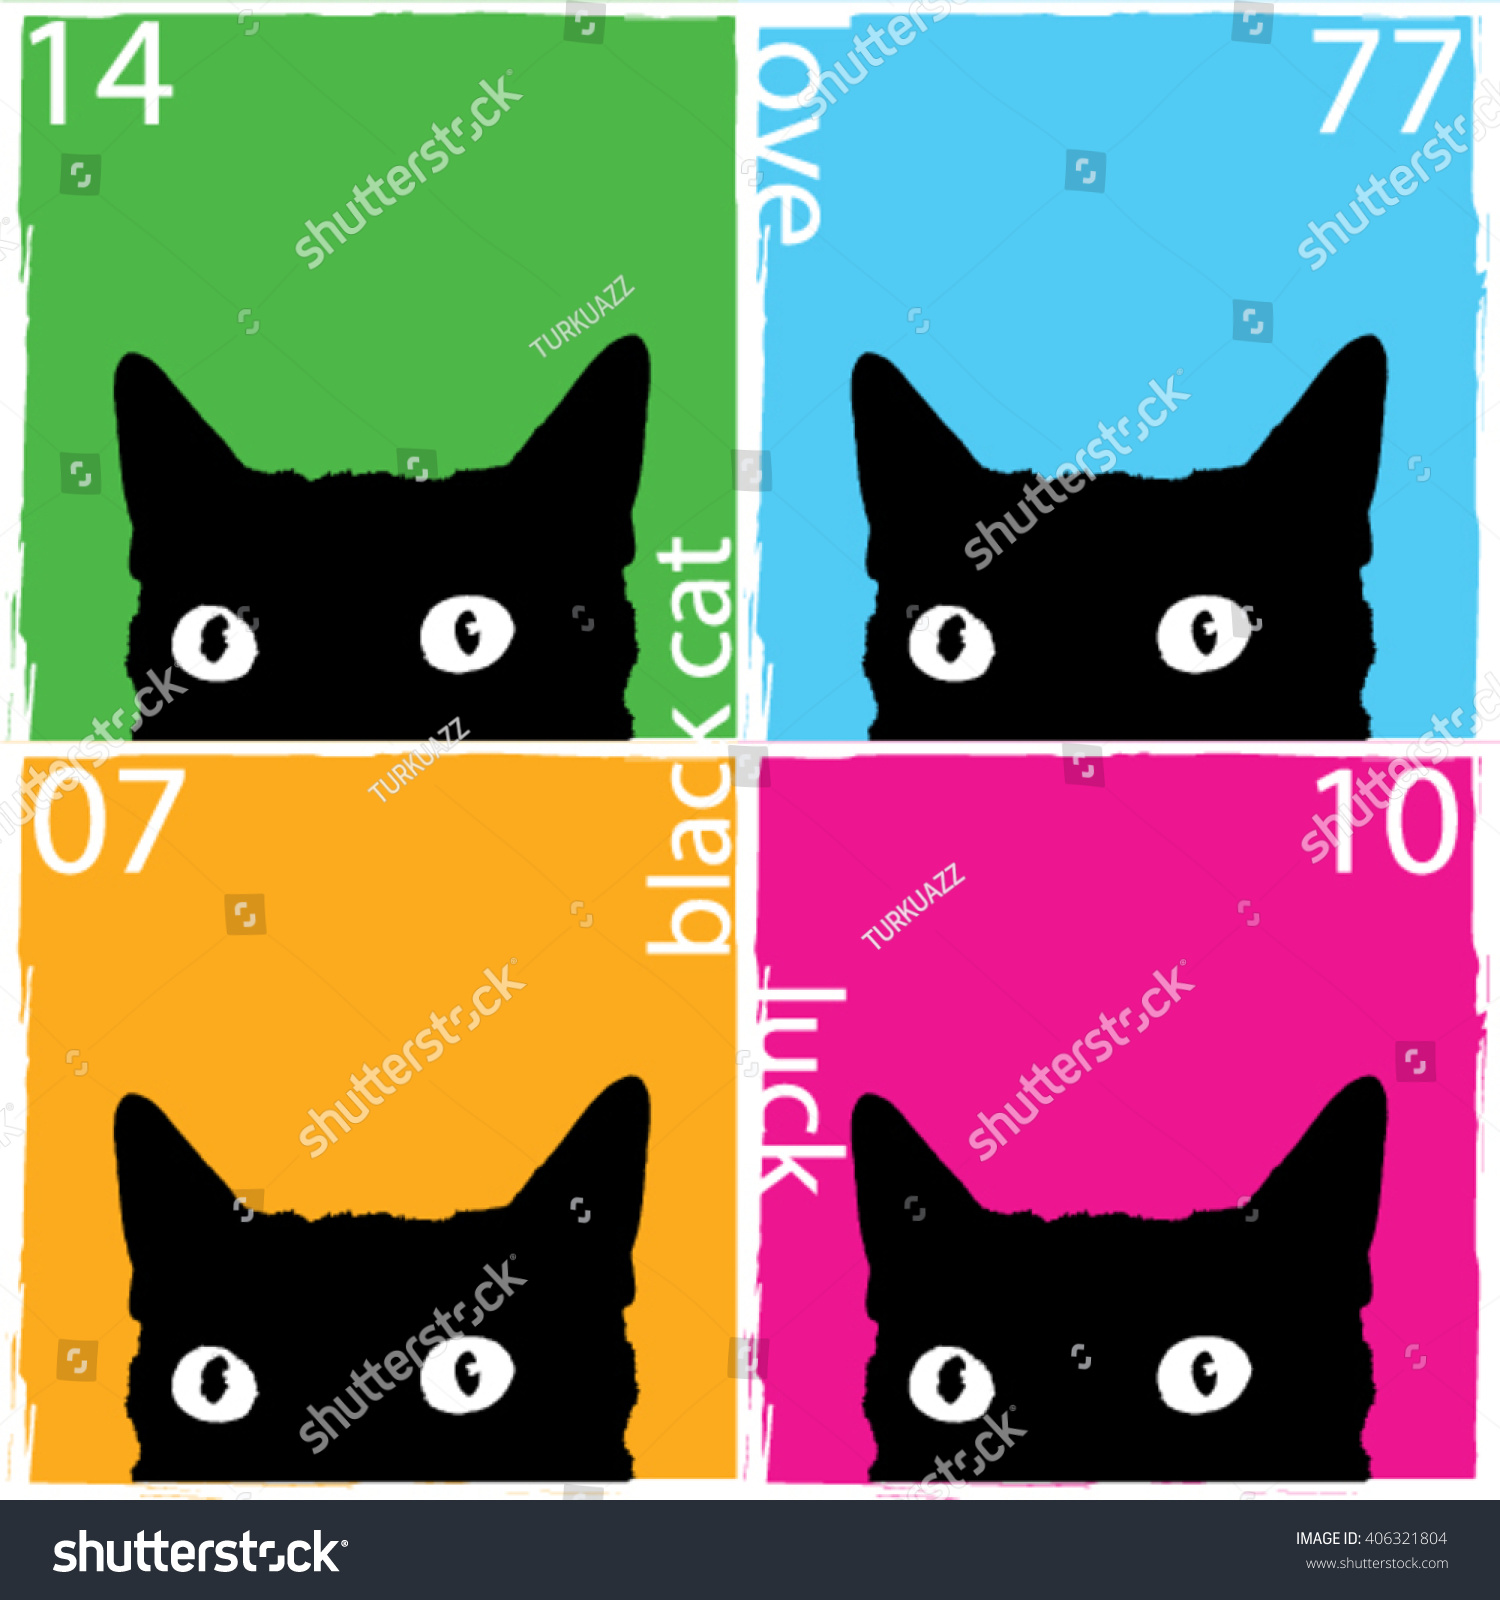 black cat pop art illustration print stock vector royalty free